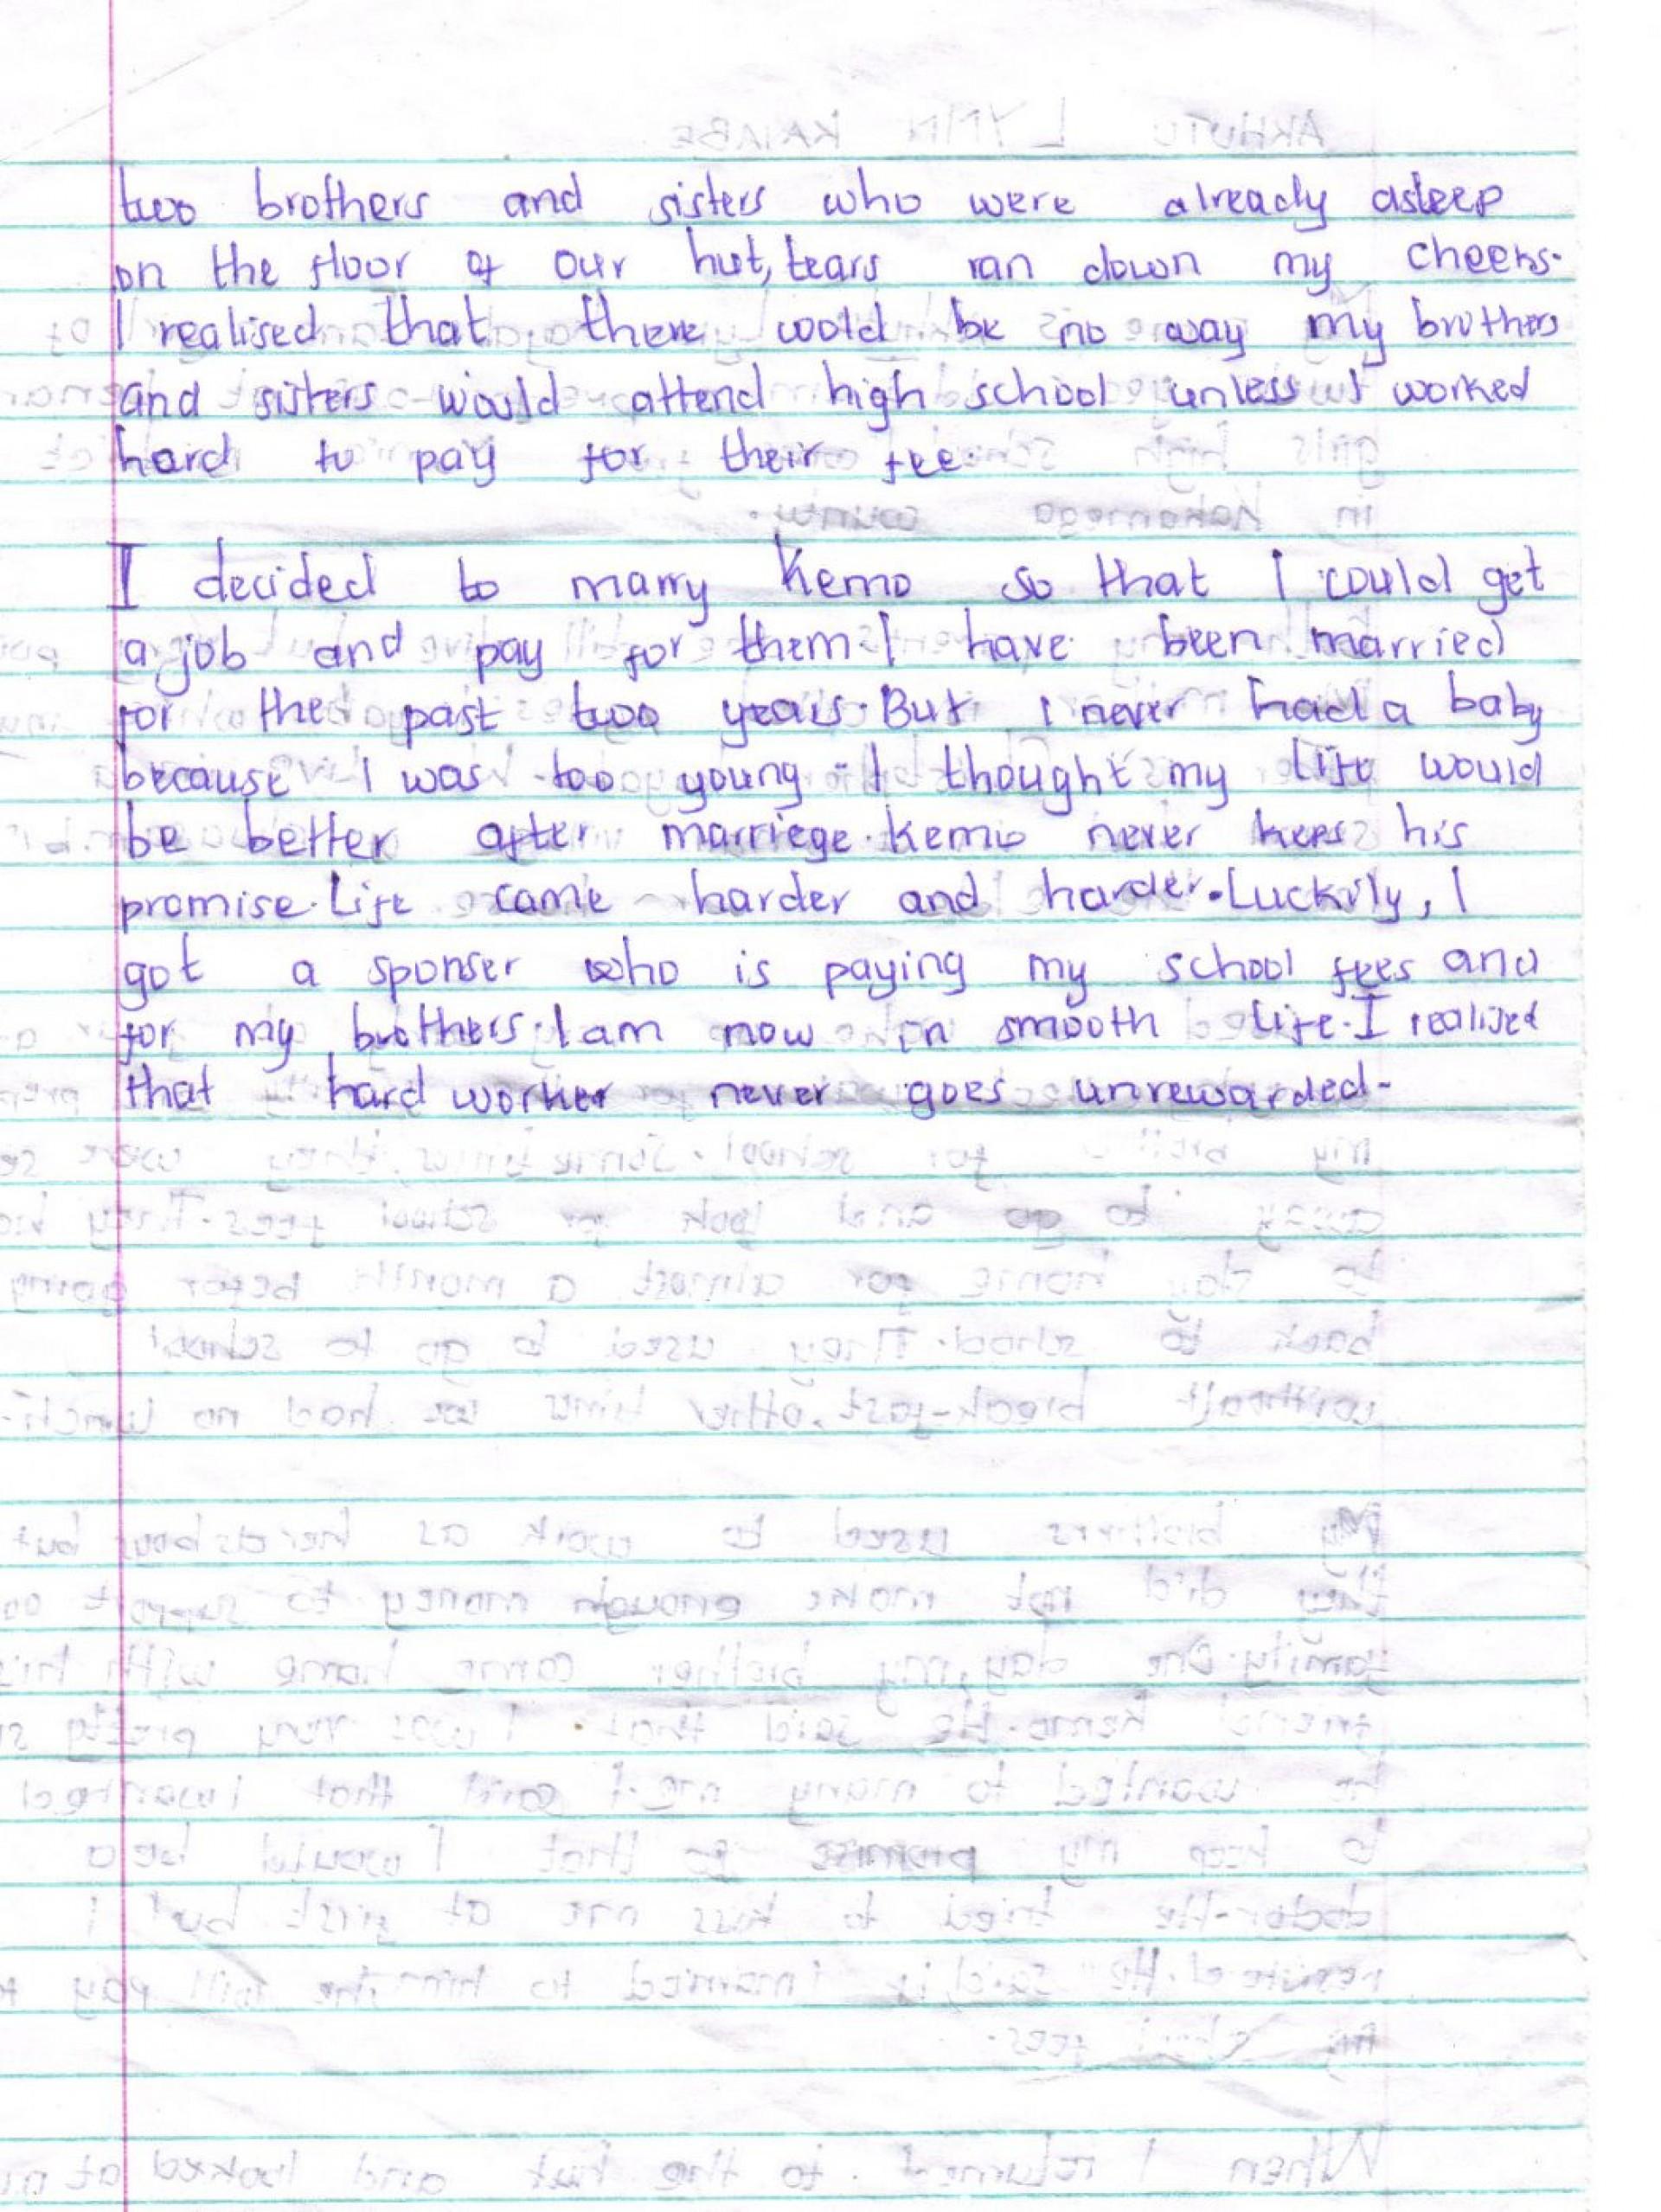 011 Hard Work Essay Essays On Gxart Sample Akhutu Lynn Kayabe First Writing Comp Pg2 Second Place Unused Au For Service Social 1048x1396 Wonderful In Urdu Example 1920